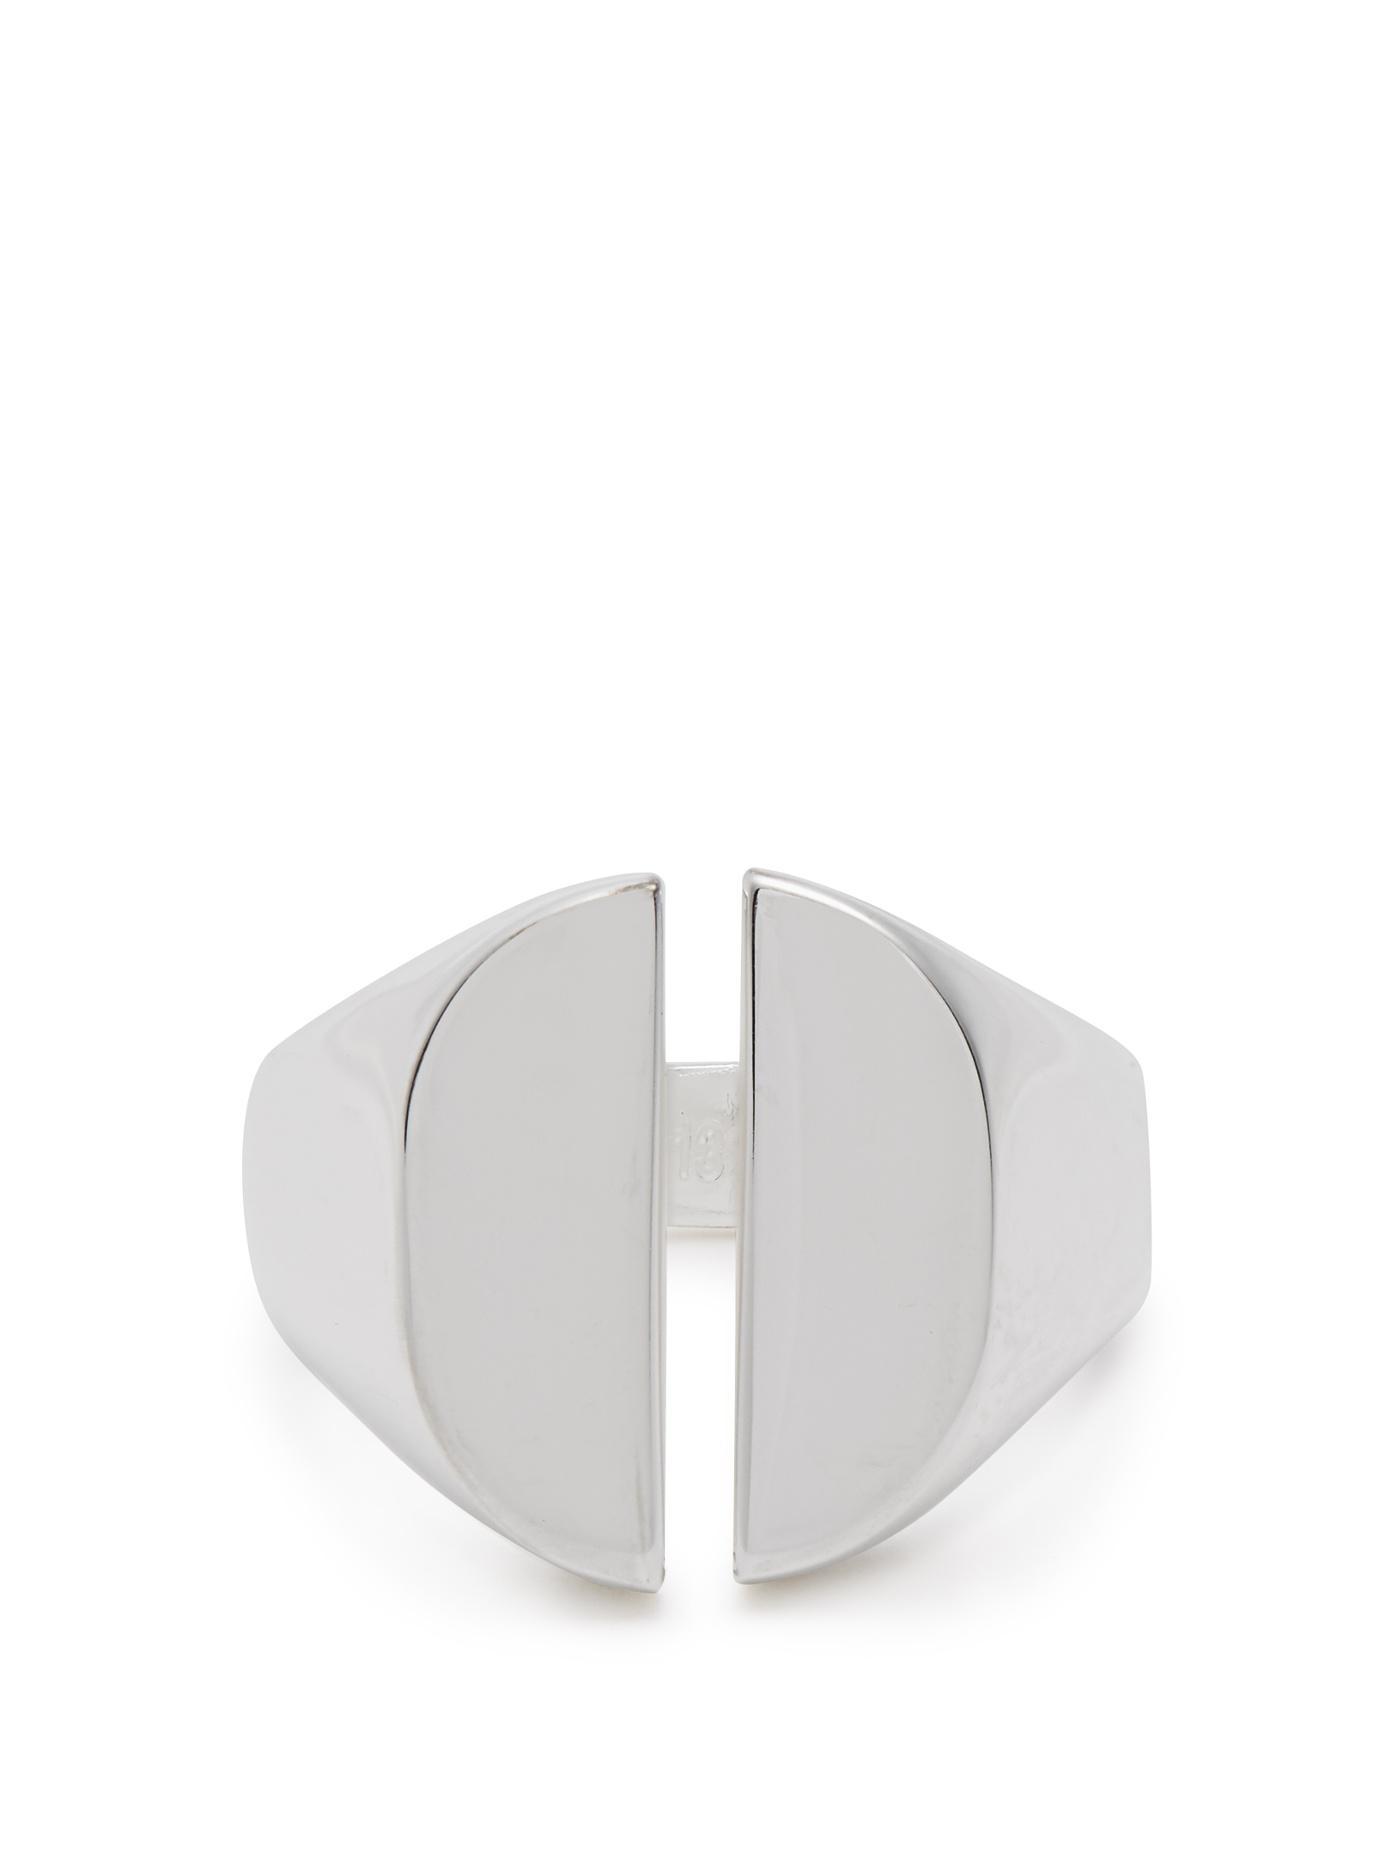 Maison Martin Margiela Cut-out silver signet ring m2hzhTAy5V